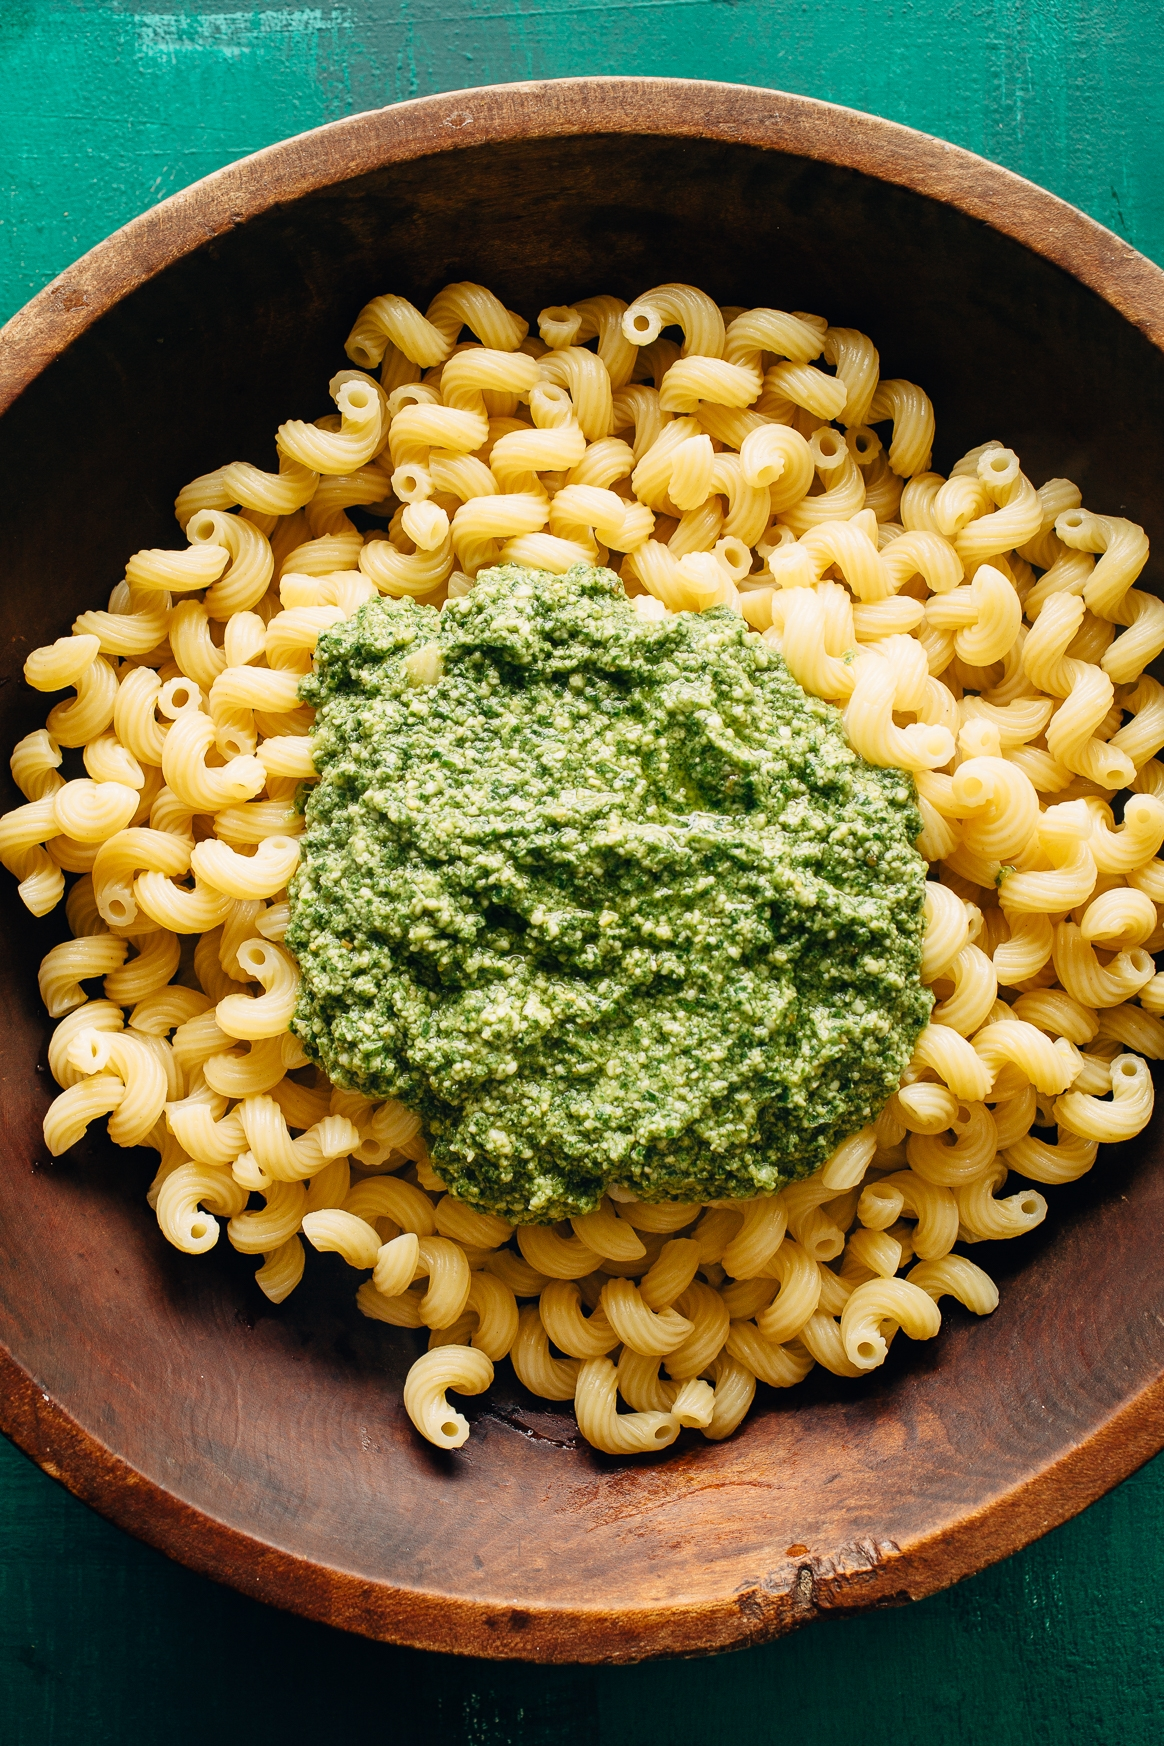 Pasta with Pesto on Top